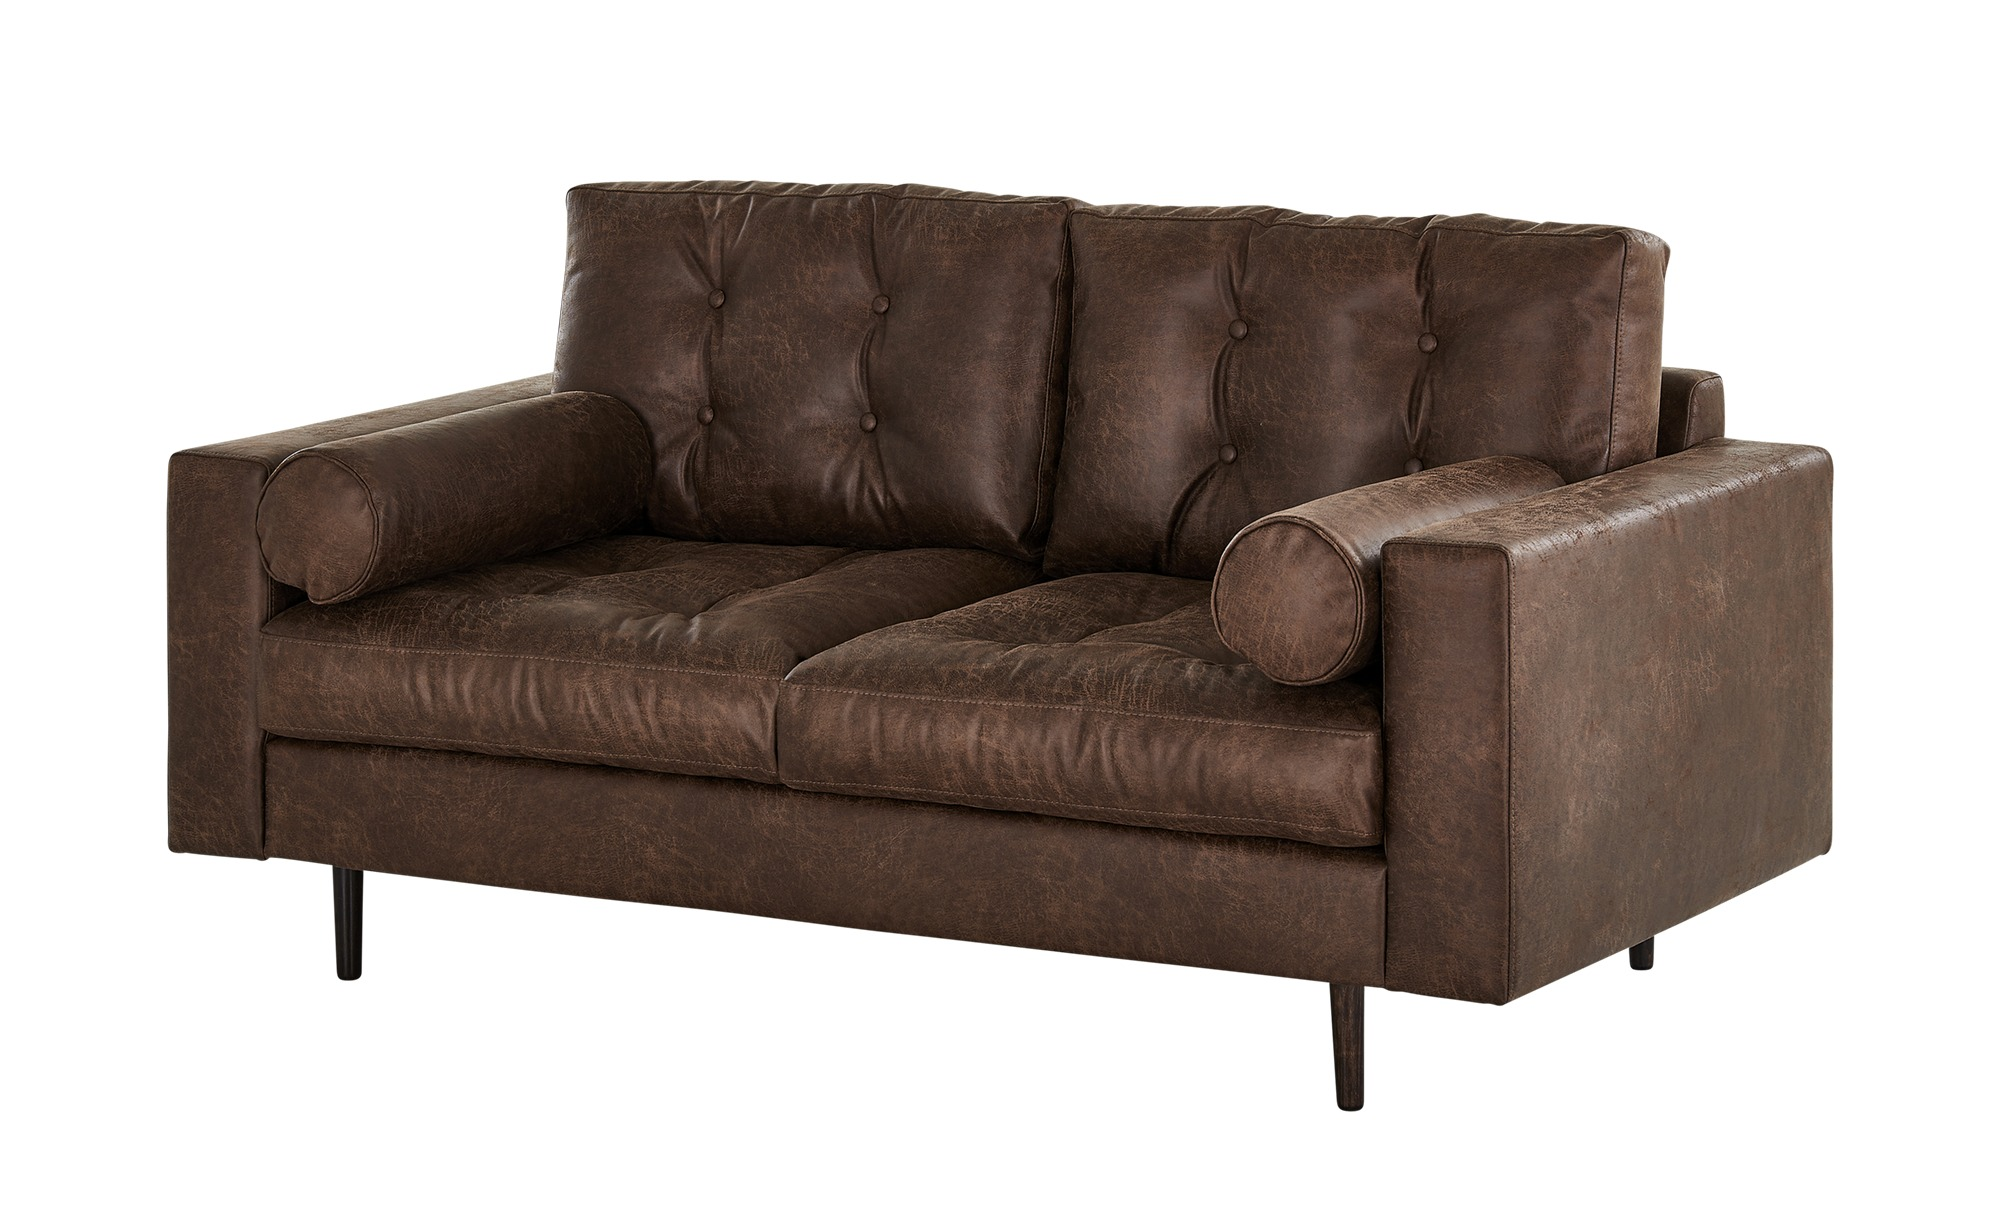 Gray & Jones Sofa  Tierra Fuego Gypsy ¦ braun ¦ Maße (cm): B: 172 H: 90 T: 92 Polstermöbel > Sofas > 2-Sitzer - Höffner